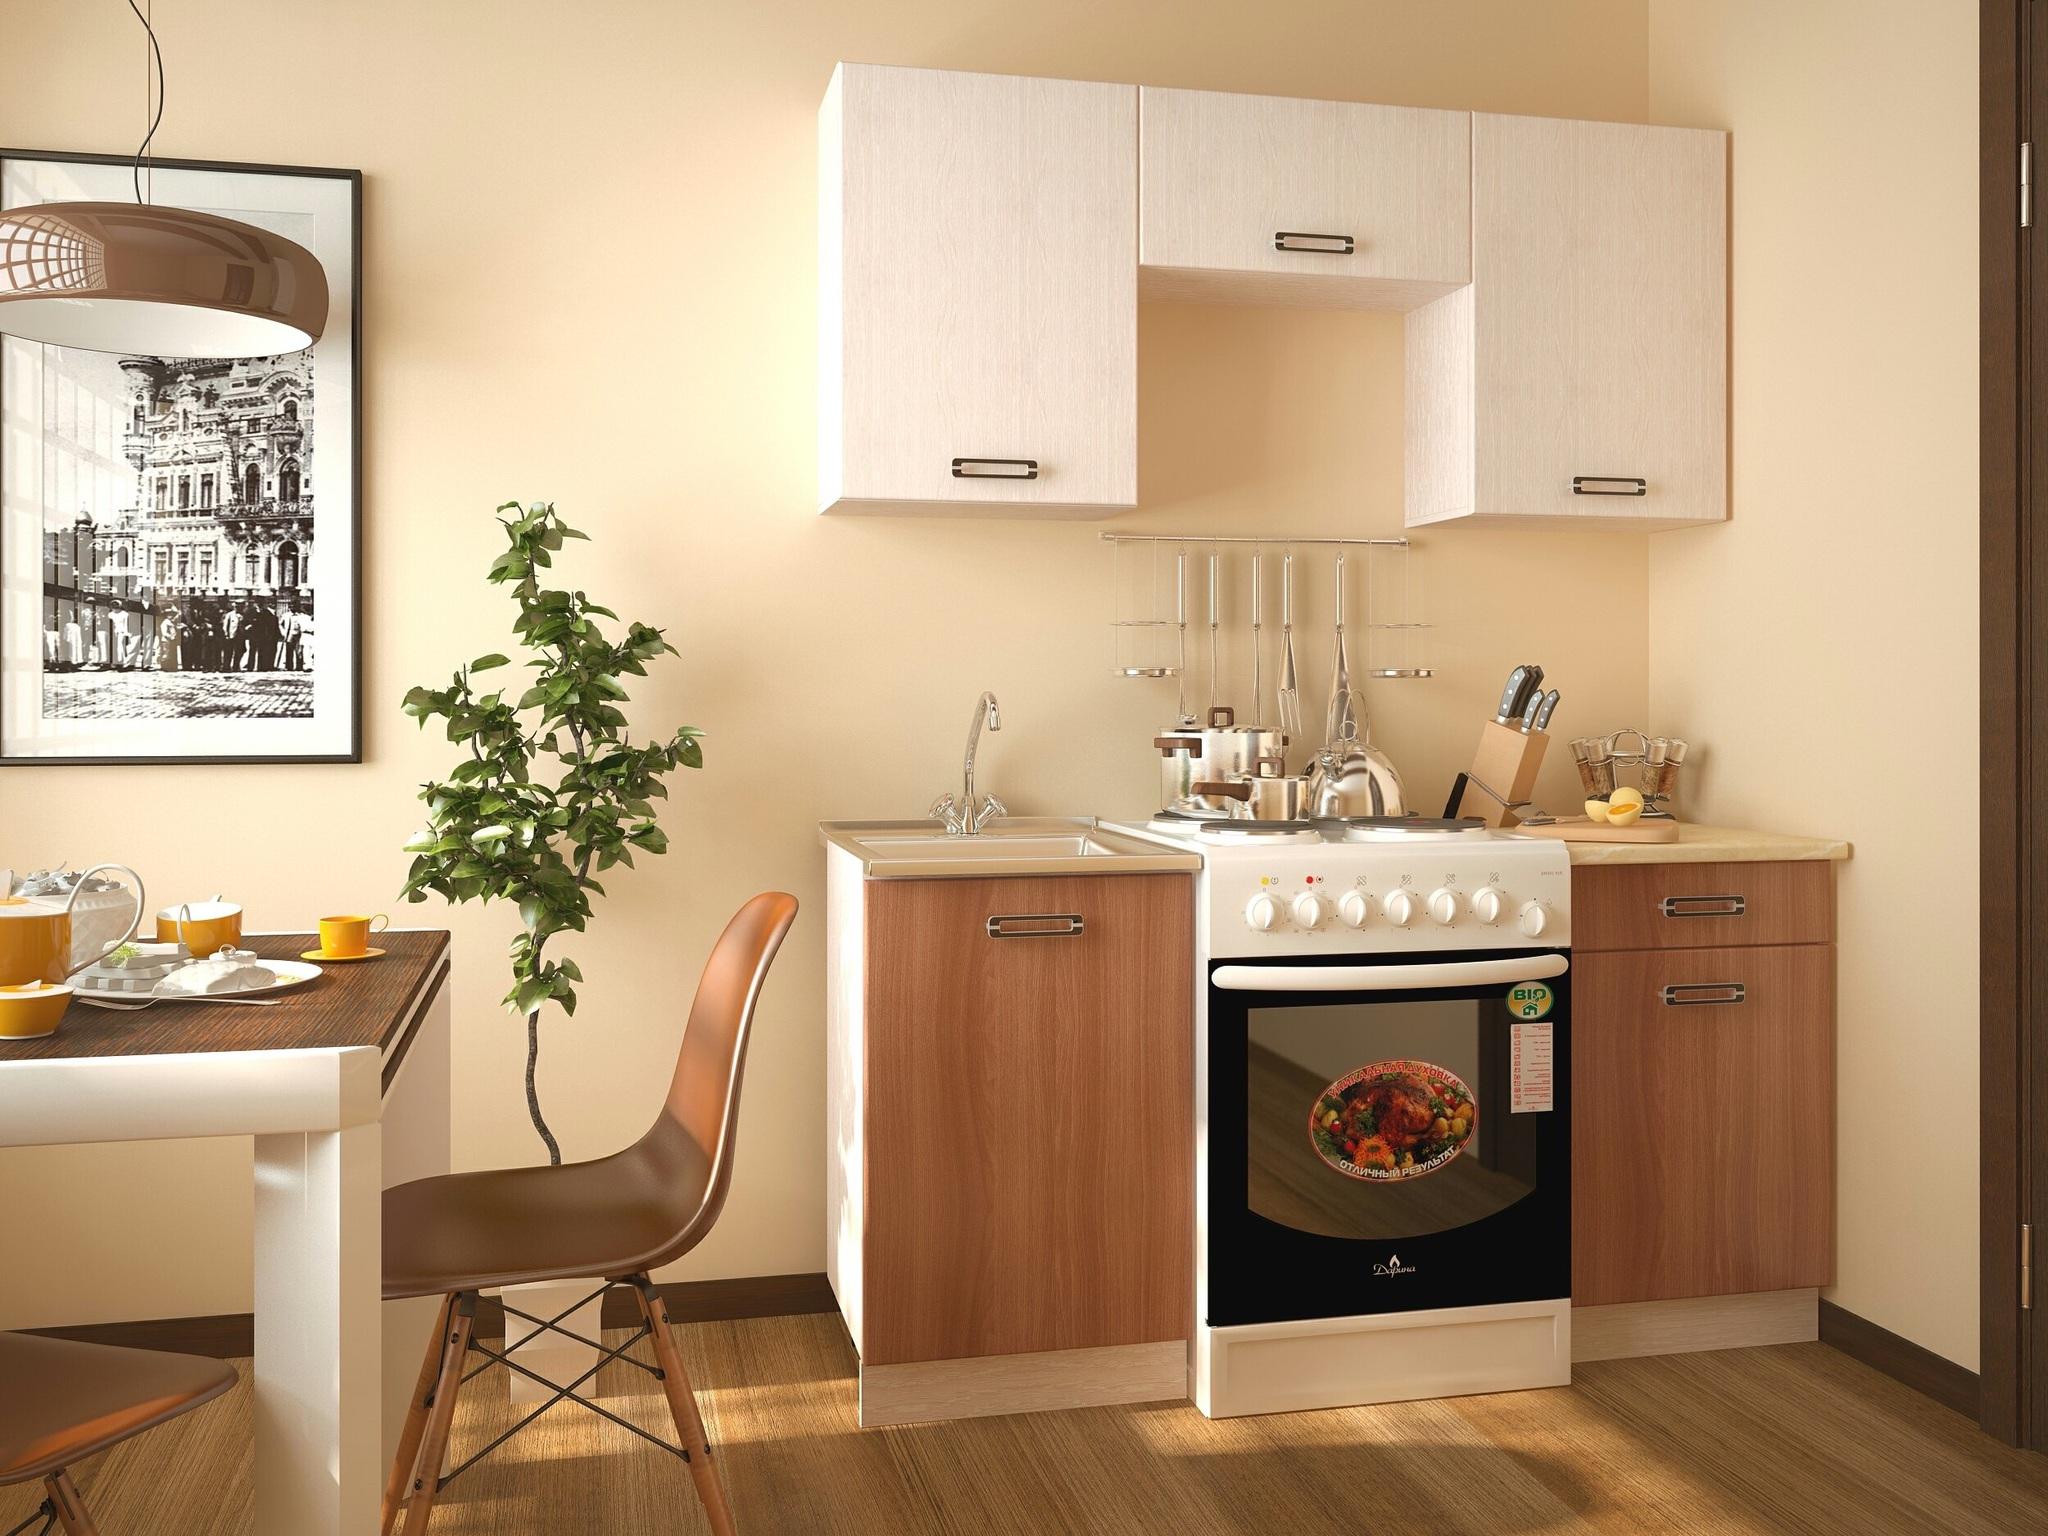 диван на кухню дешево спб